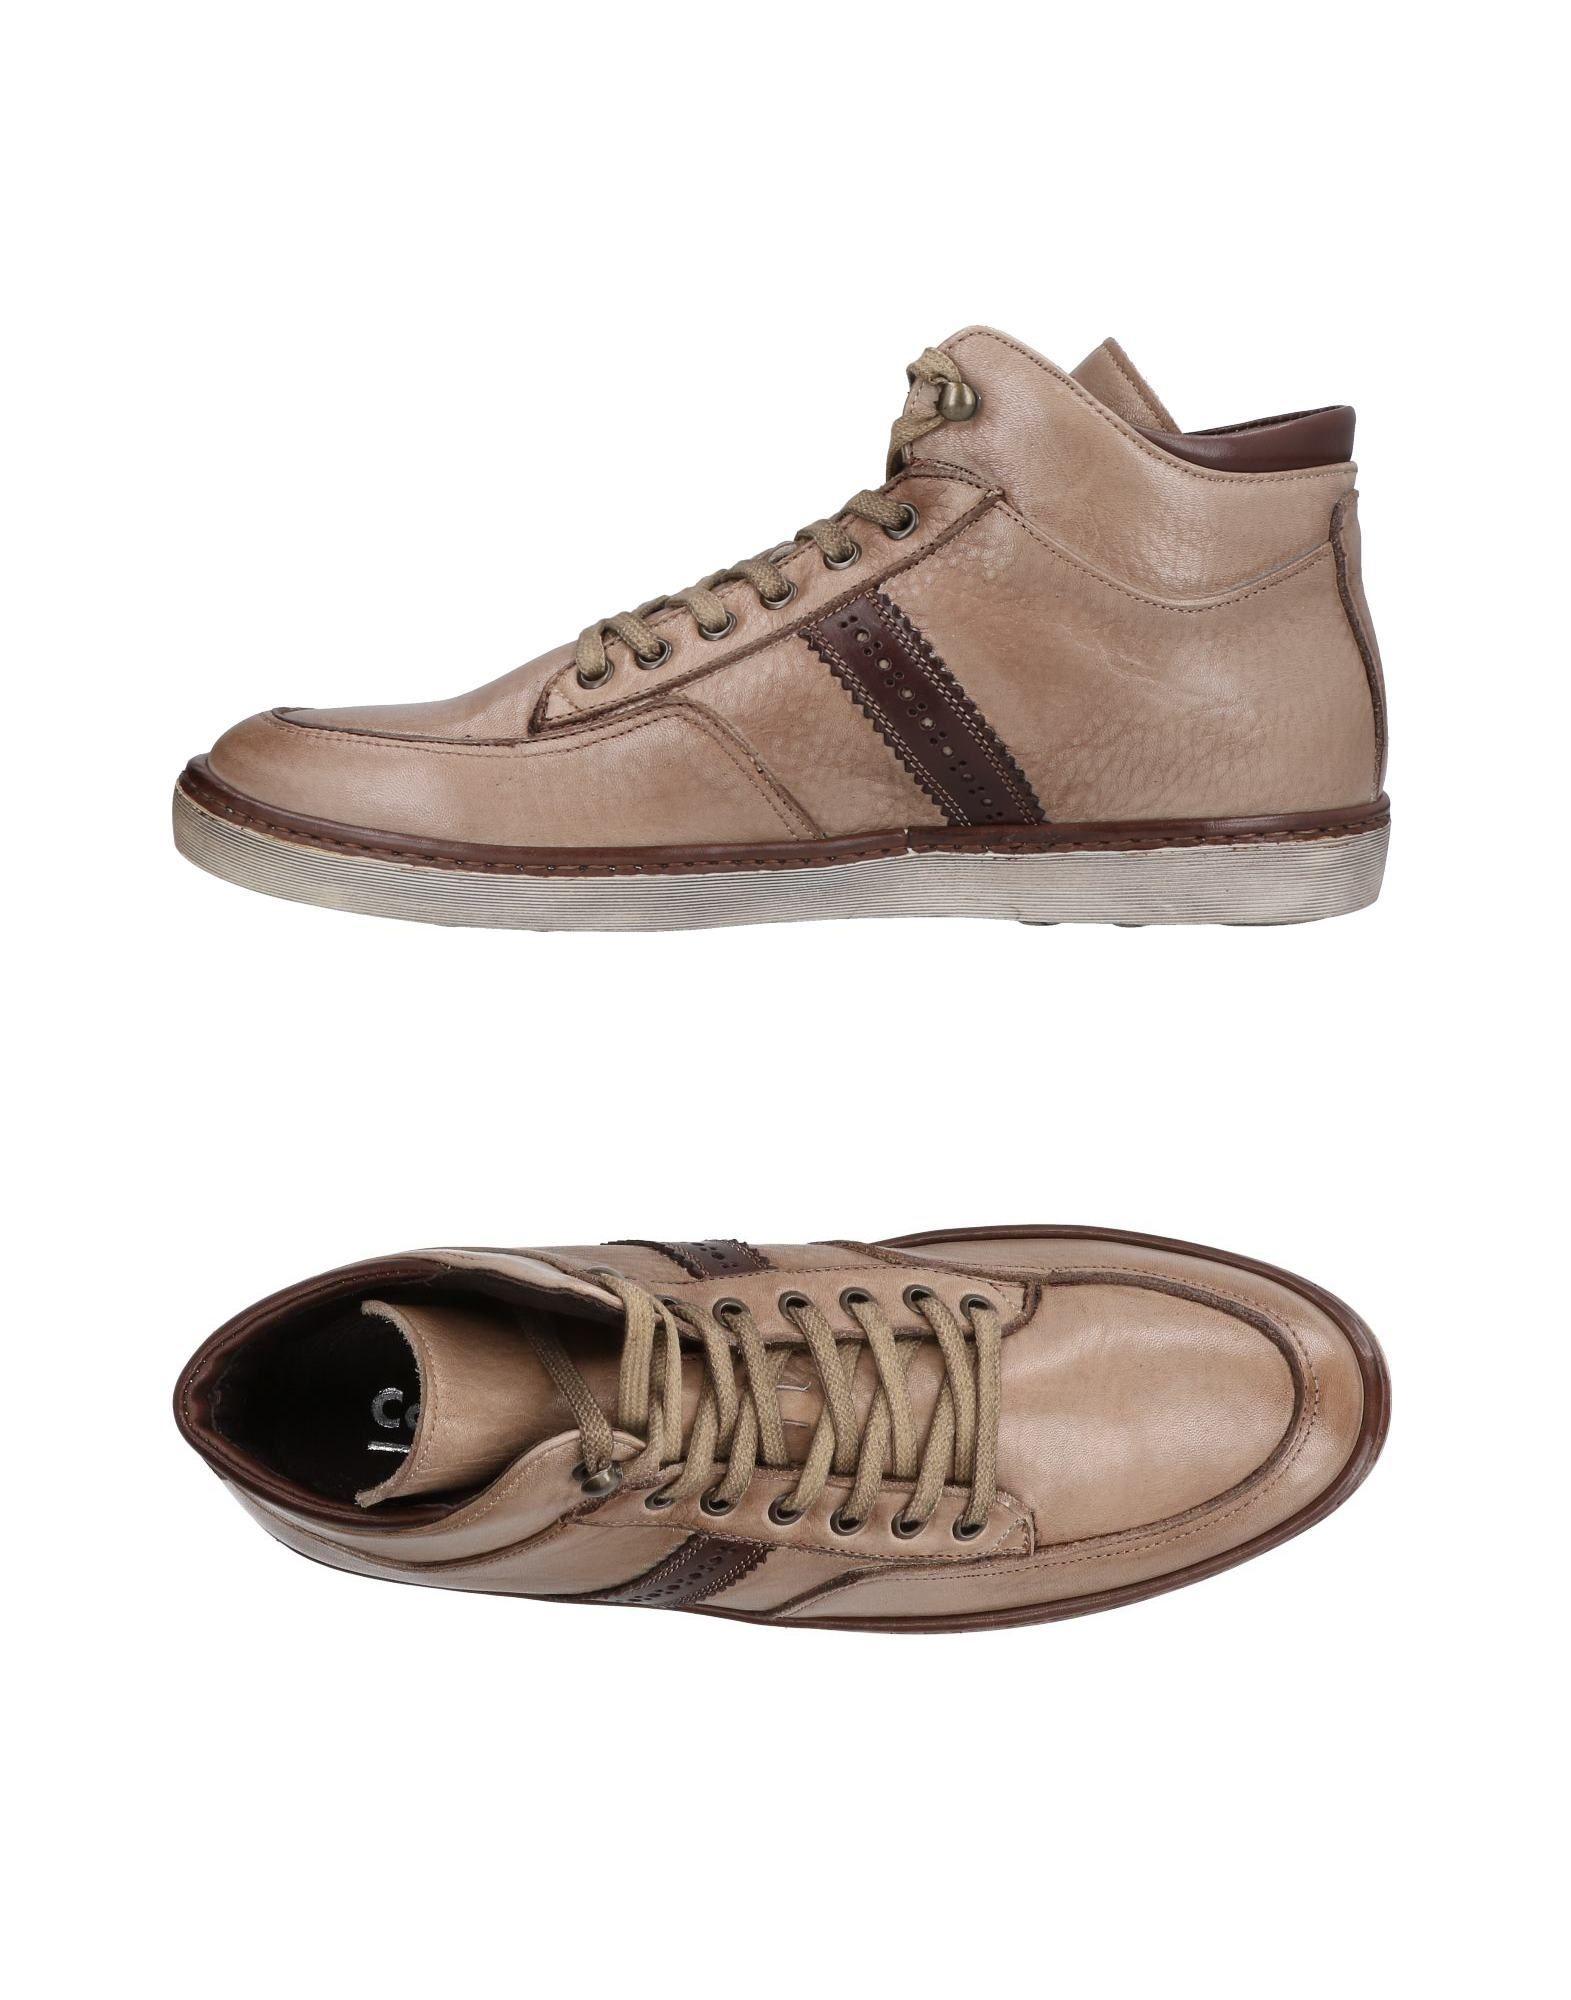 Rabatt echte Schuhe Calpierre Turnschuhes Herren 11462190BR